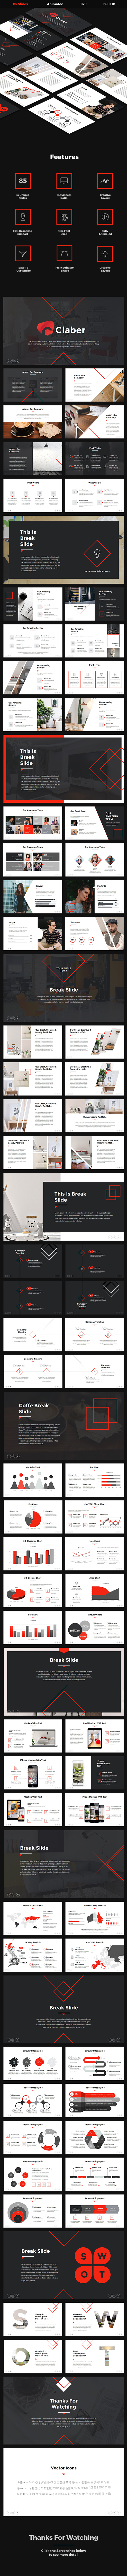 Claber - Creative Google Slides Template - Google Slides Presentation Templates